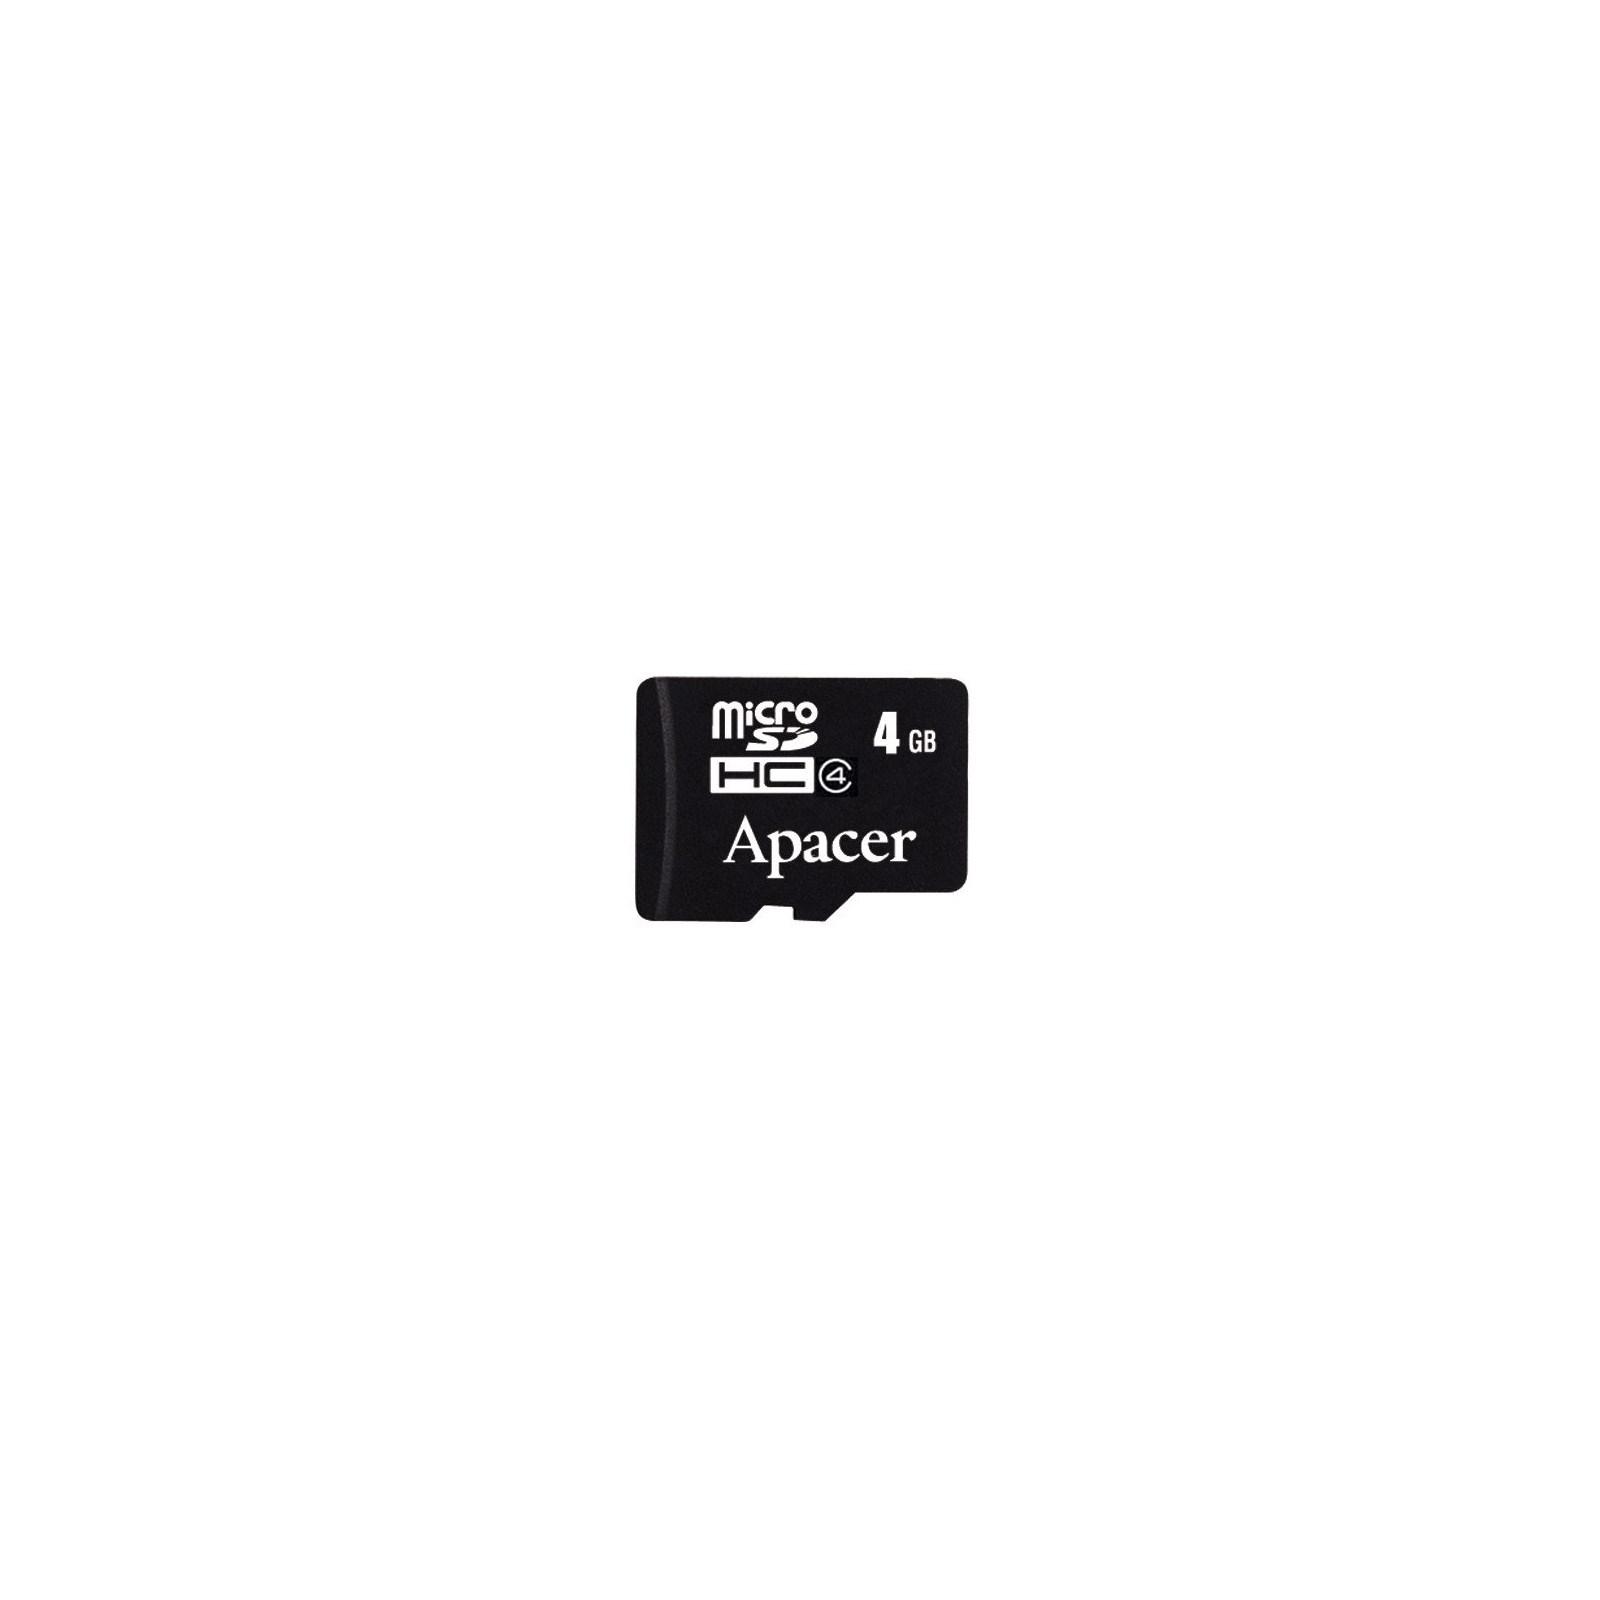 Карта памяти 4Gb microSDHC class 4 Apacer (AP4GMCSH4-RA)